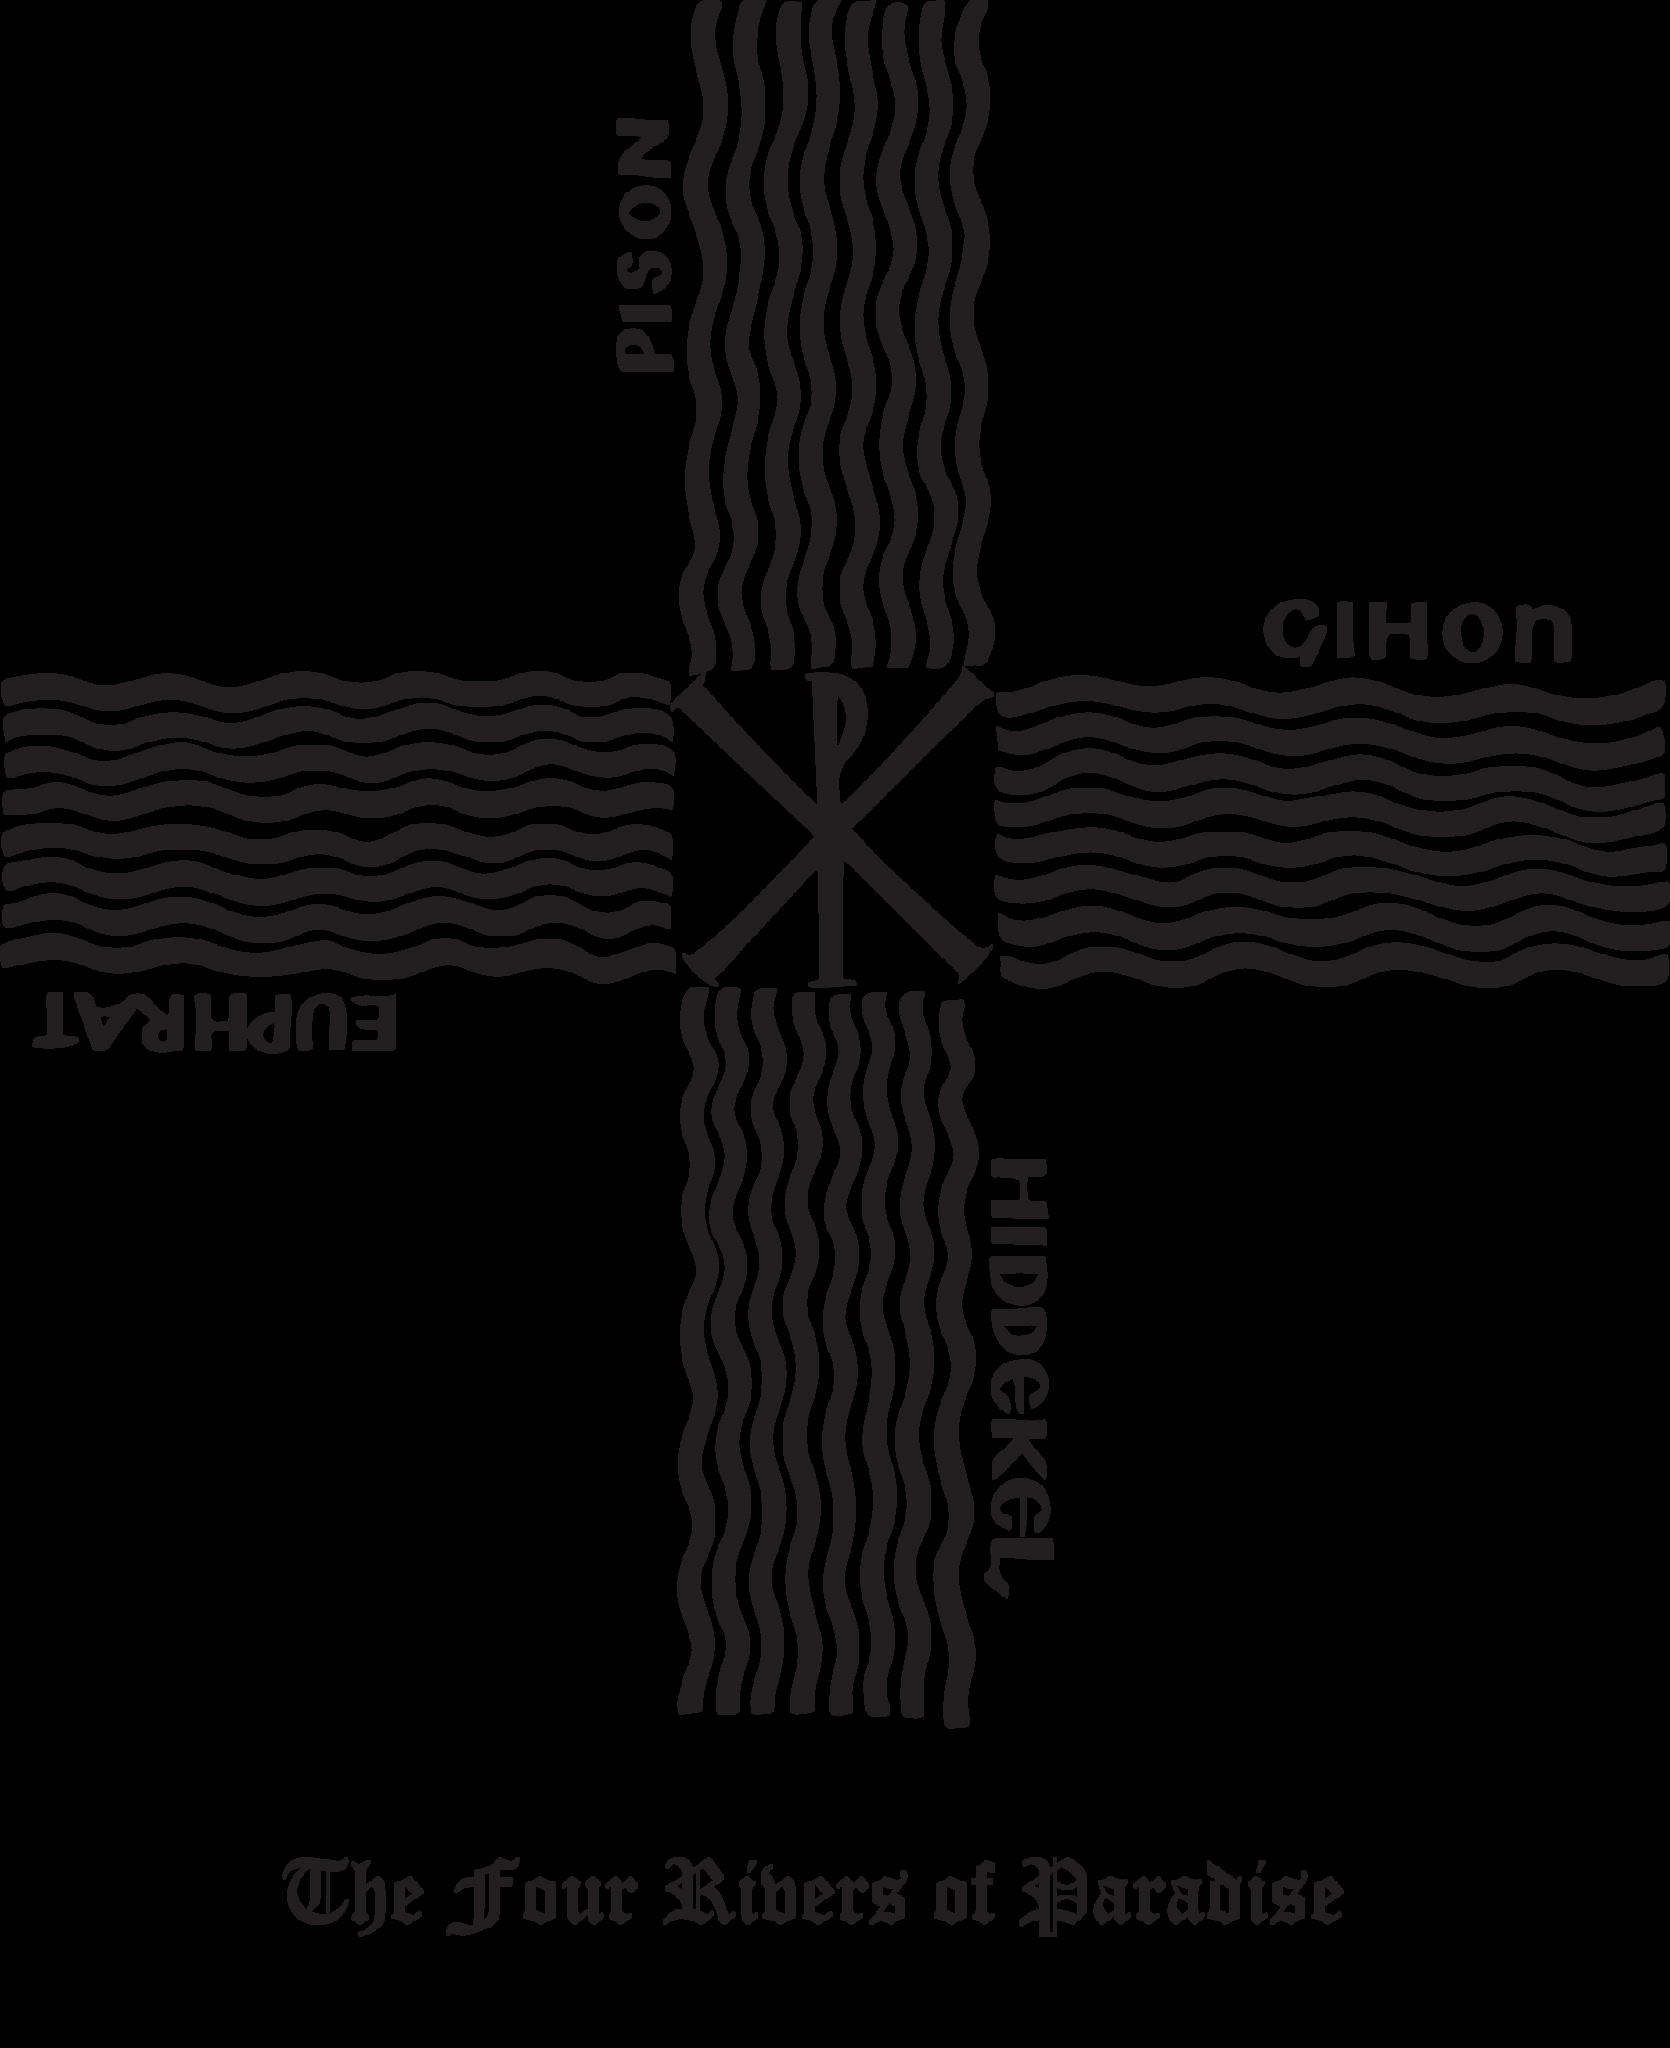 Rudolf koch christian symbol 104 4 rivers of paradise rudolf koch christian symbol 104 4 rivers of paradise symbols and hand drawn biocorpaavc Gallery